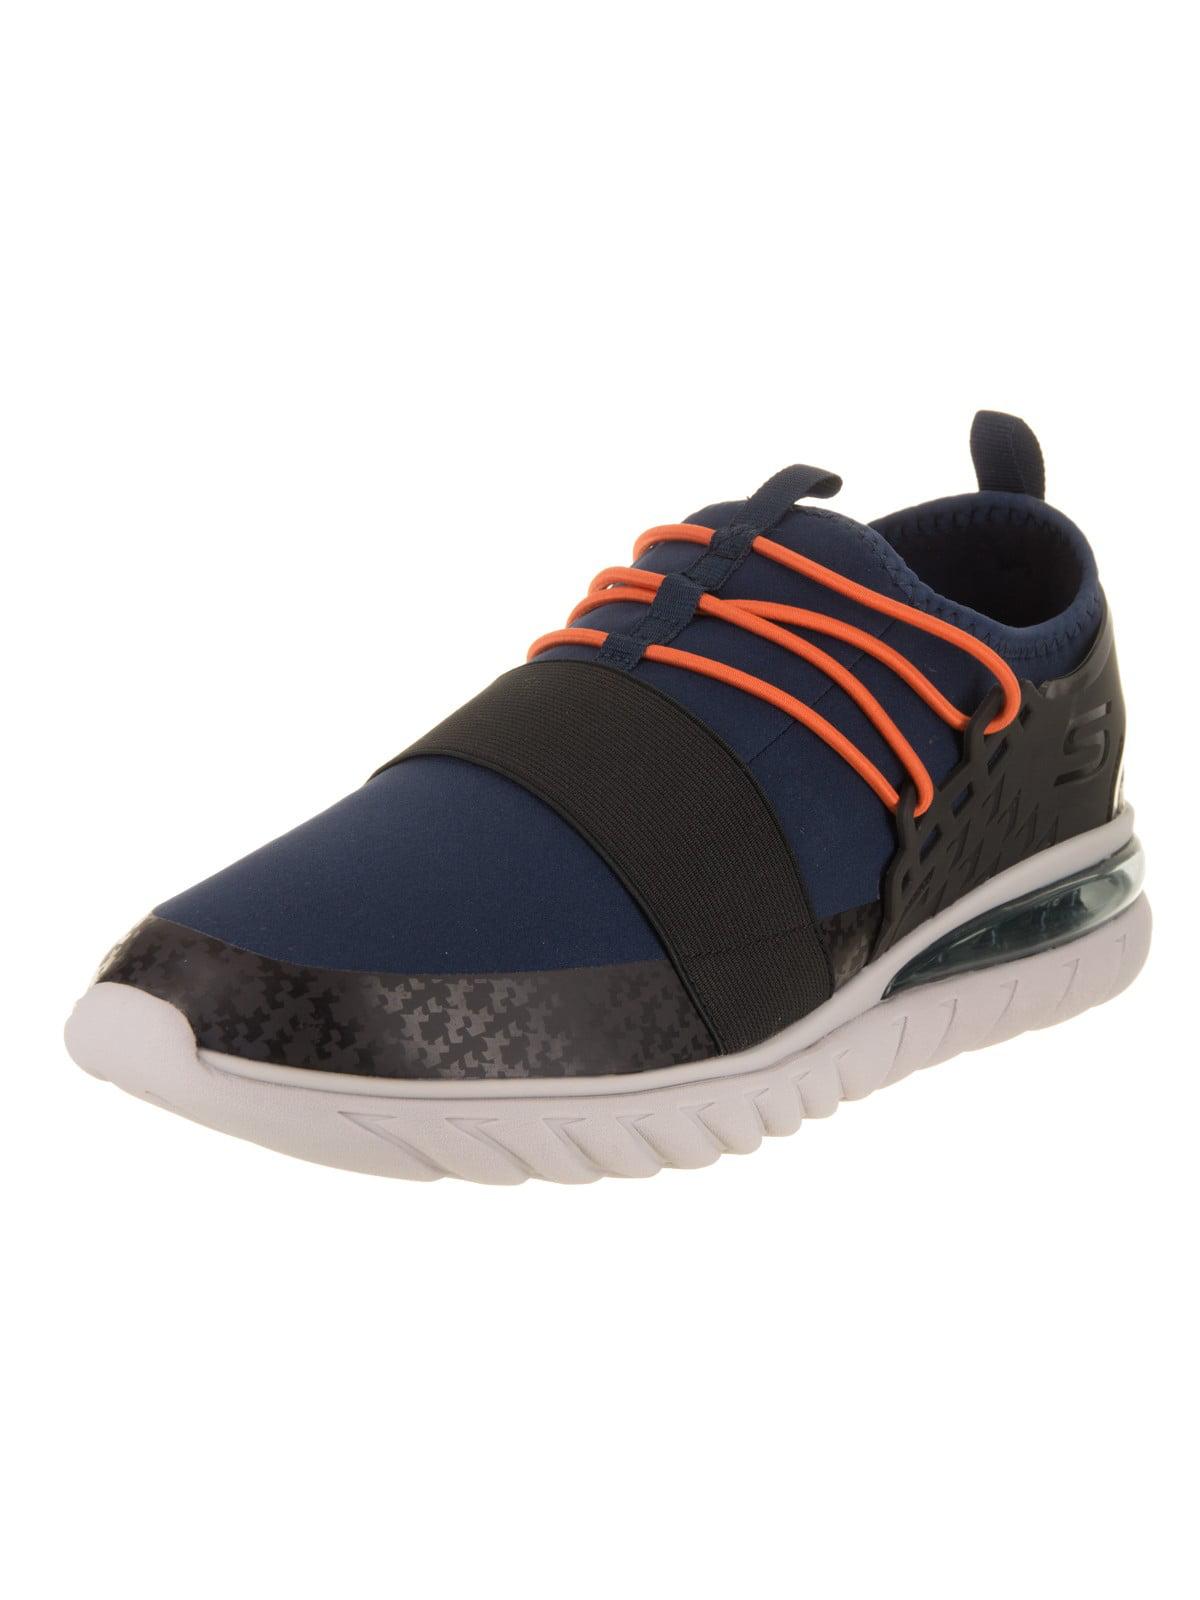 skechers men's skech - air conflux casual shoe